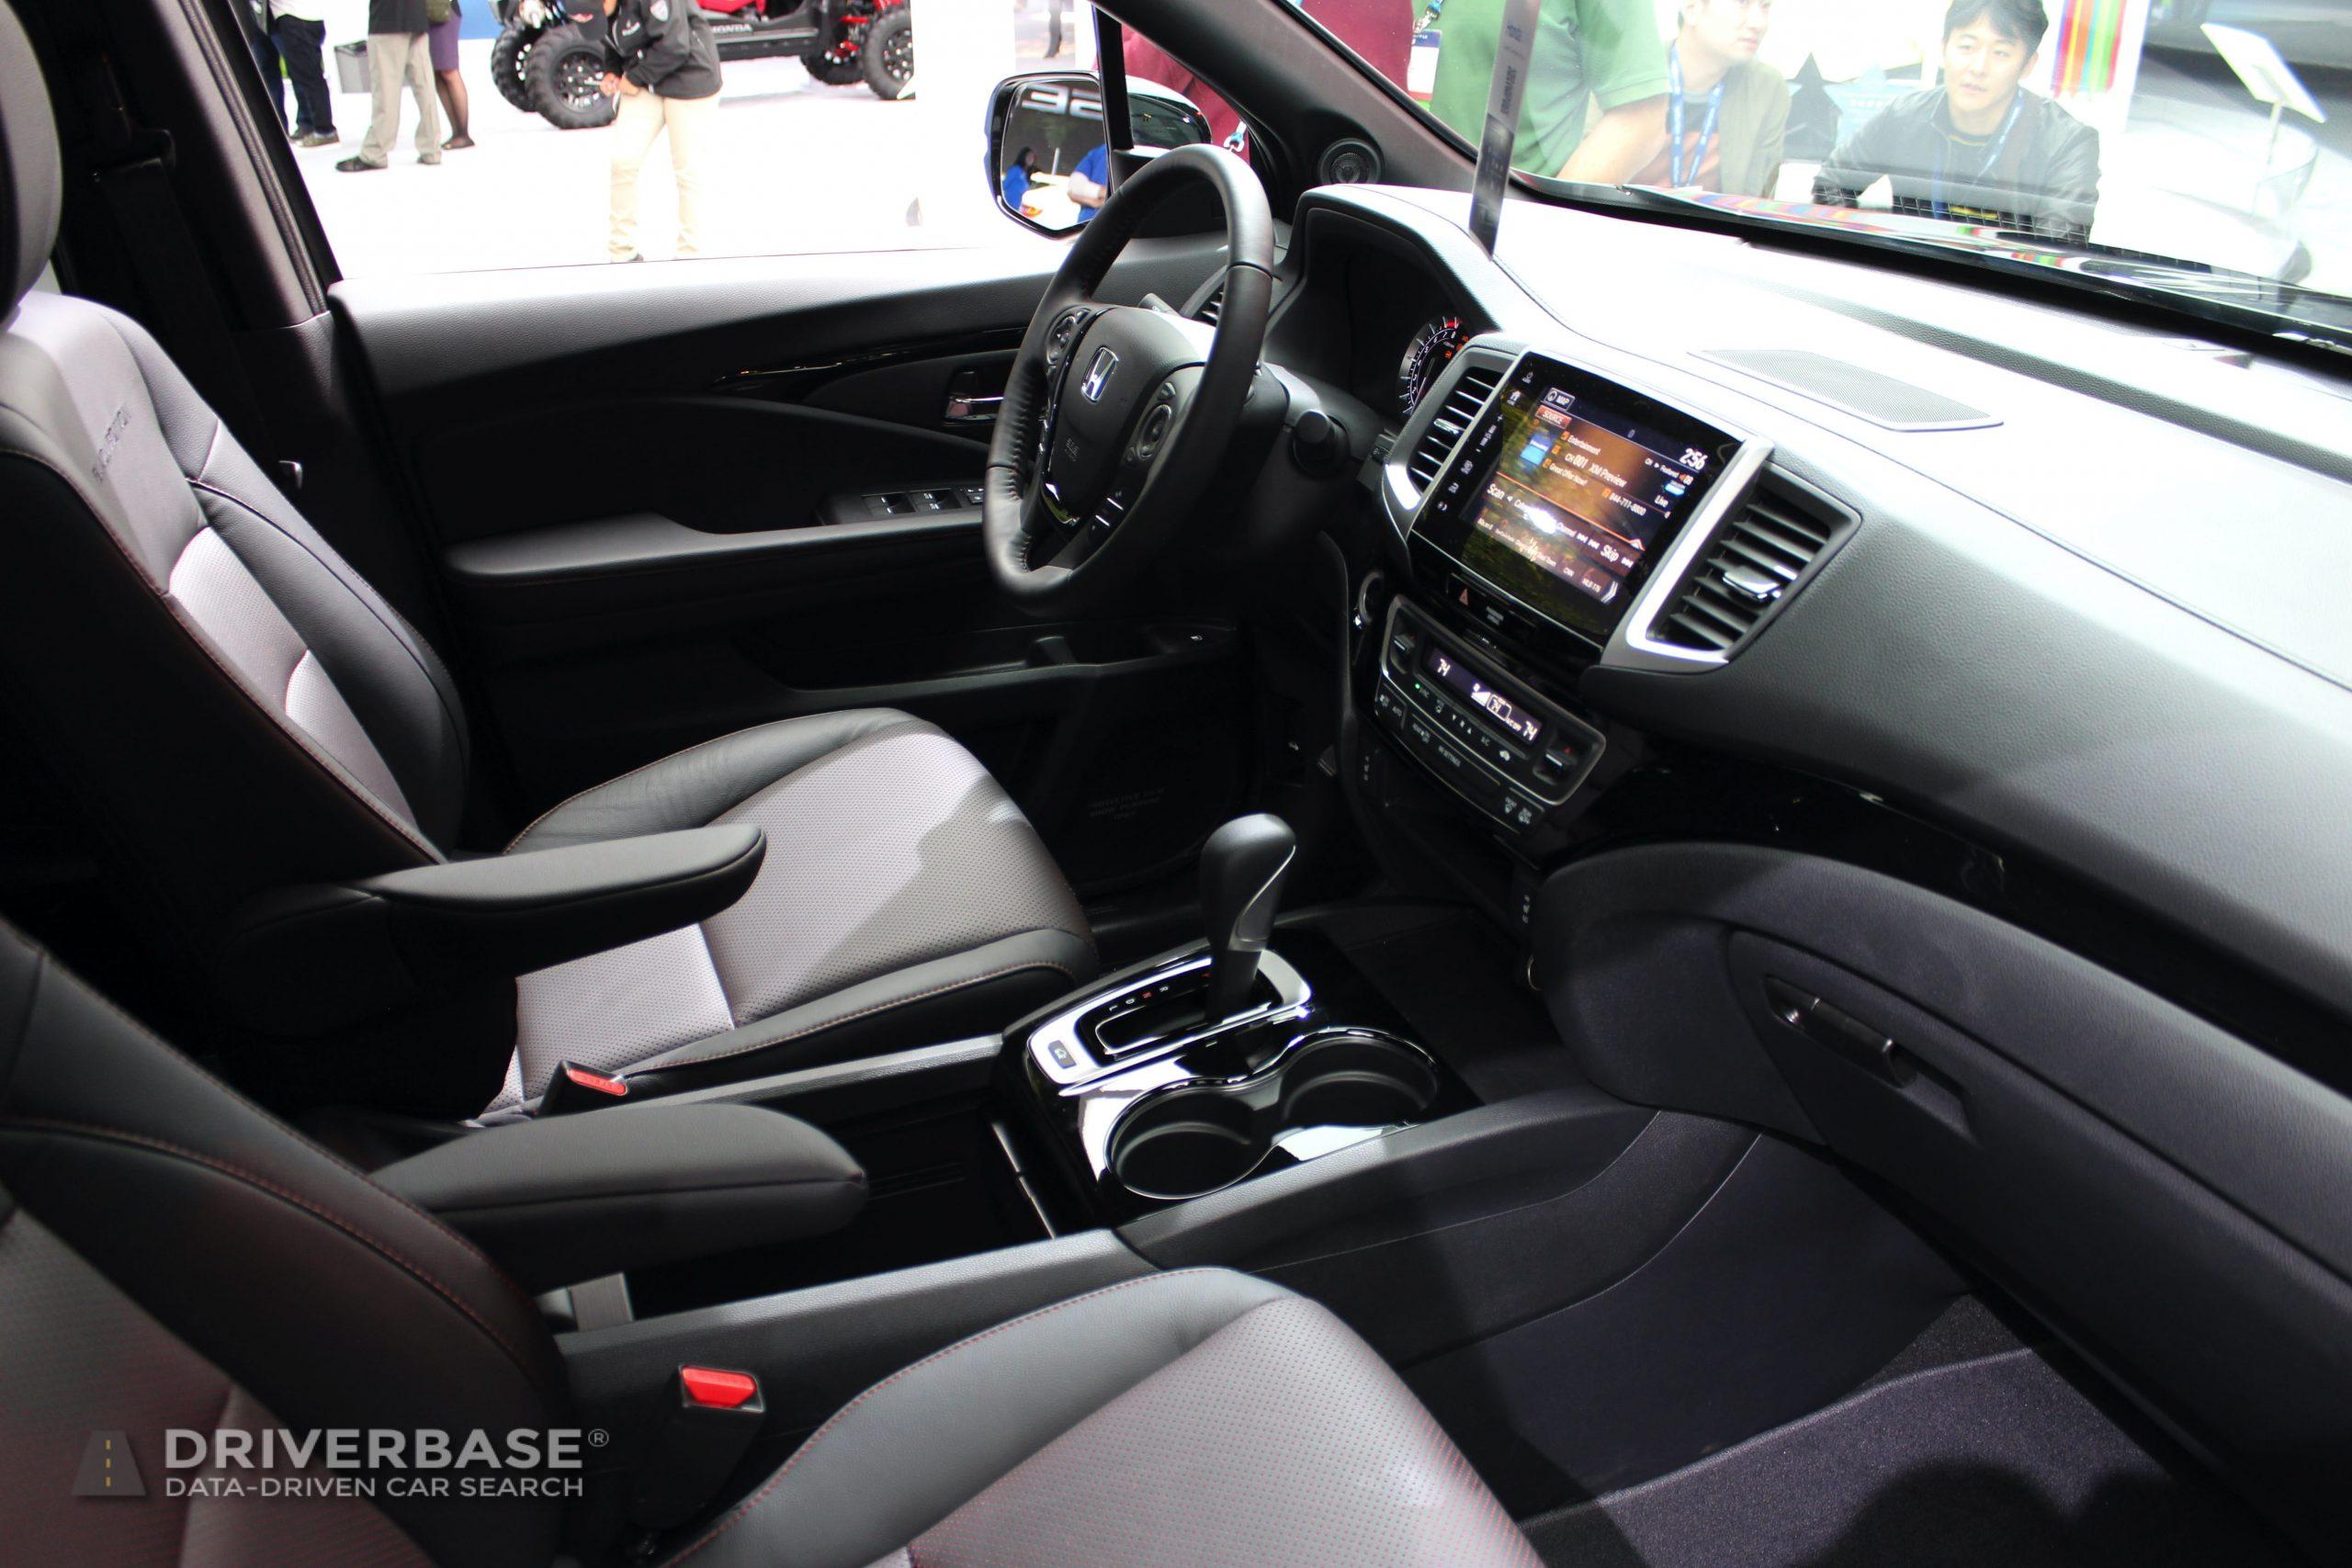 2020 Honda Ridgeline All Wheel Drive at the 2019 Los Angeles Auto Show